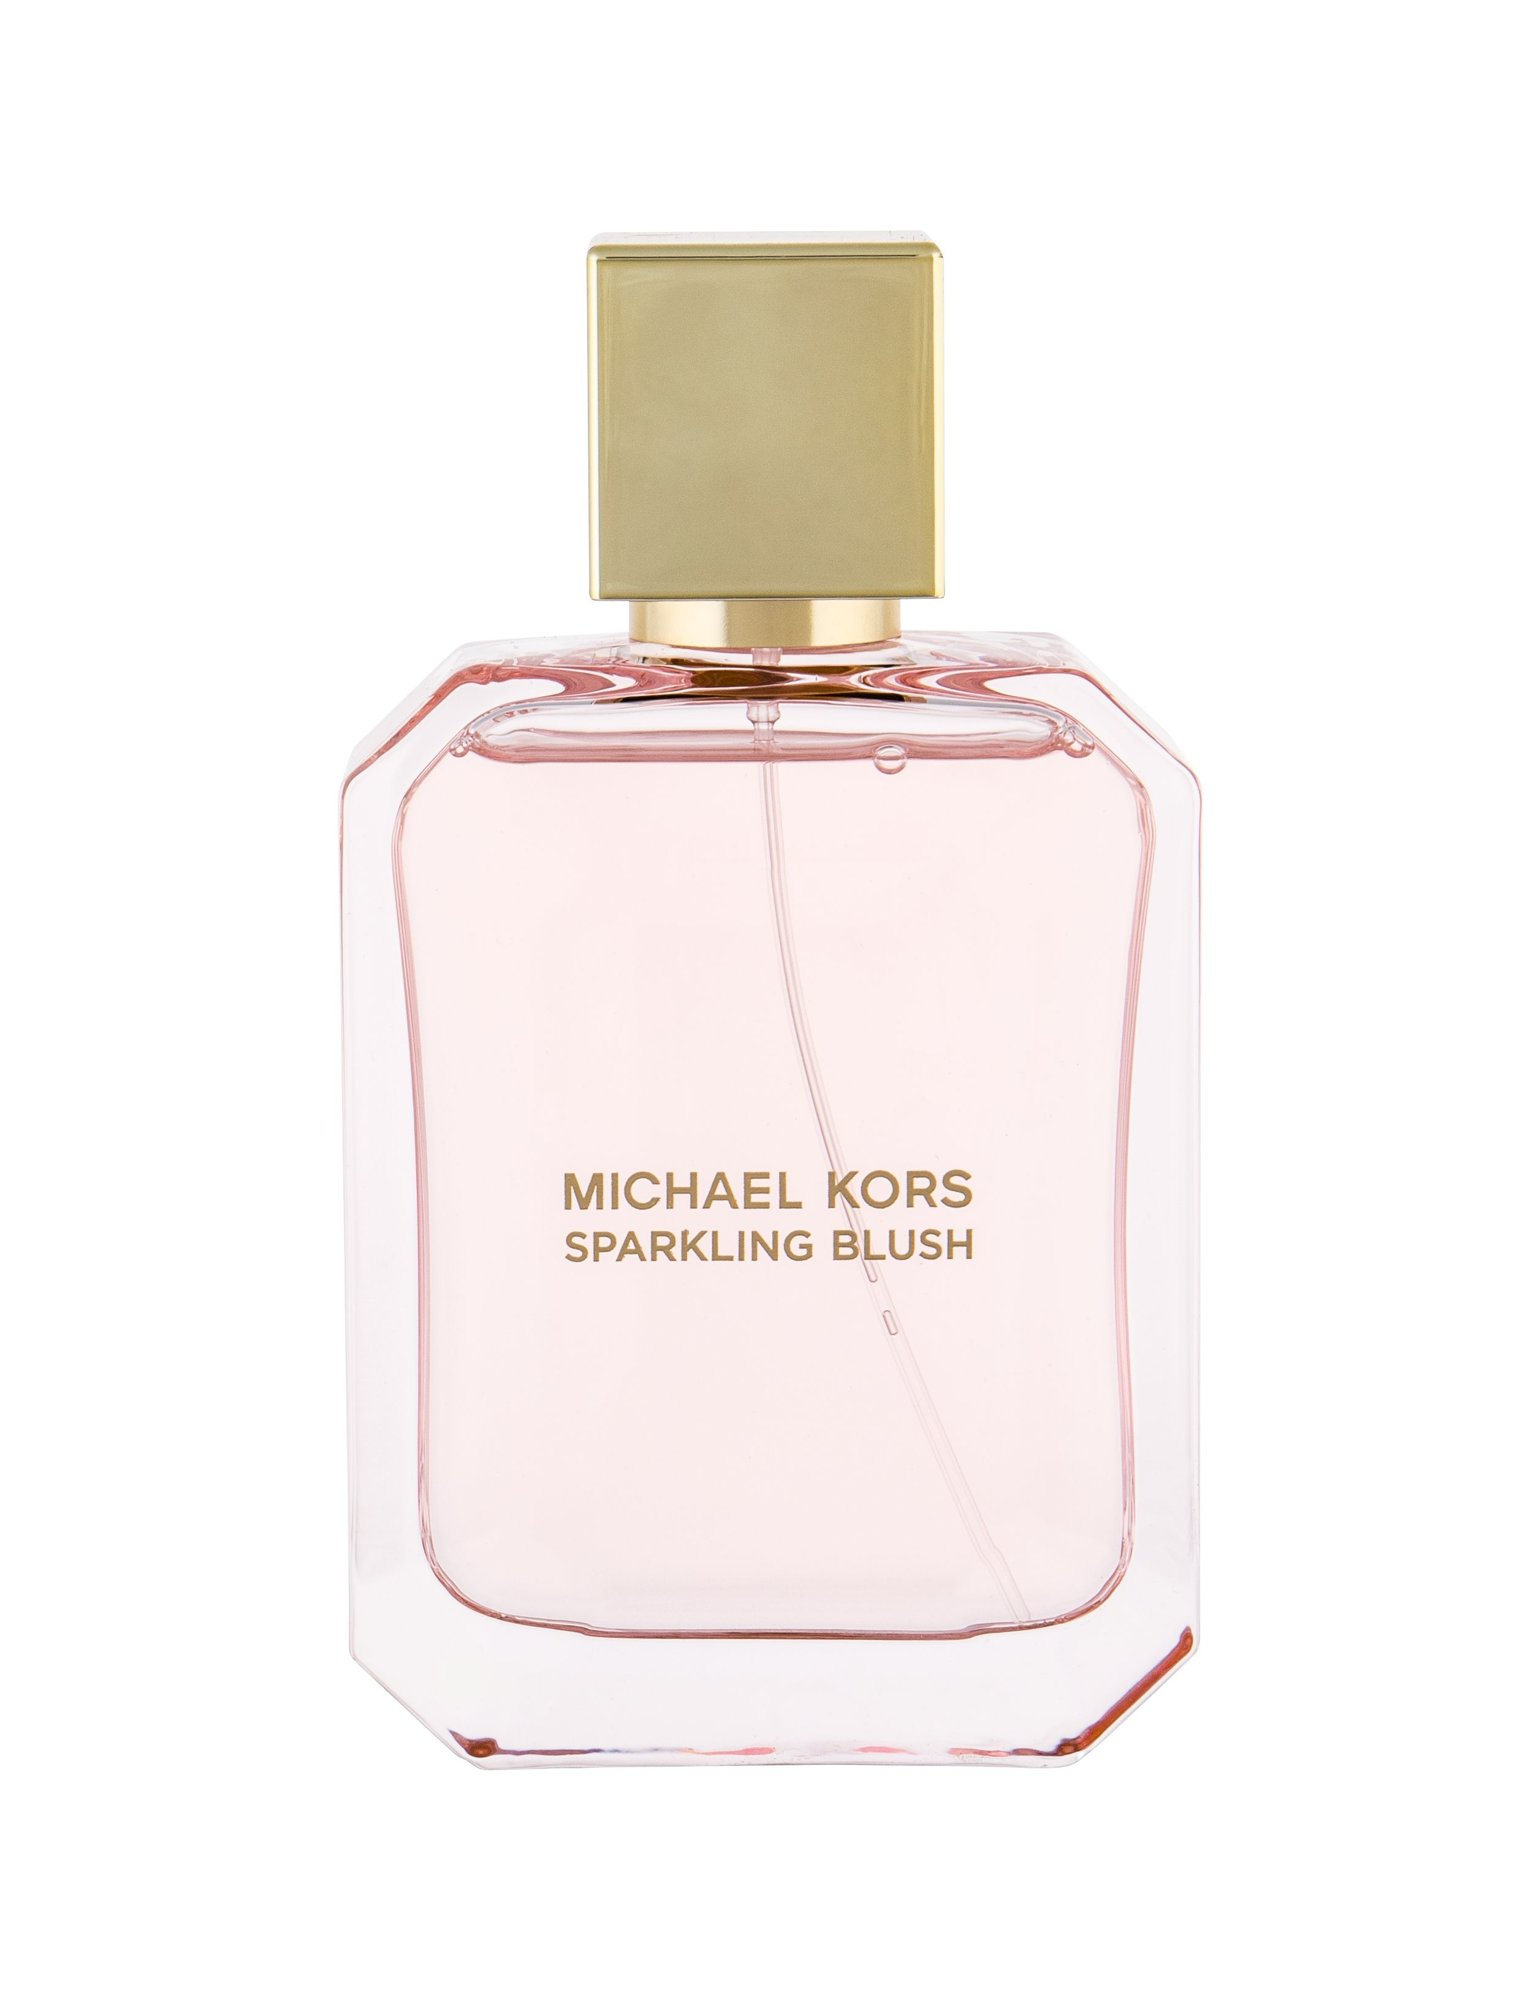 Michael Kors Sparkling Blush, Parfumovaná voda 100ml